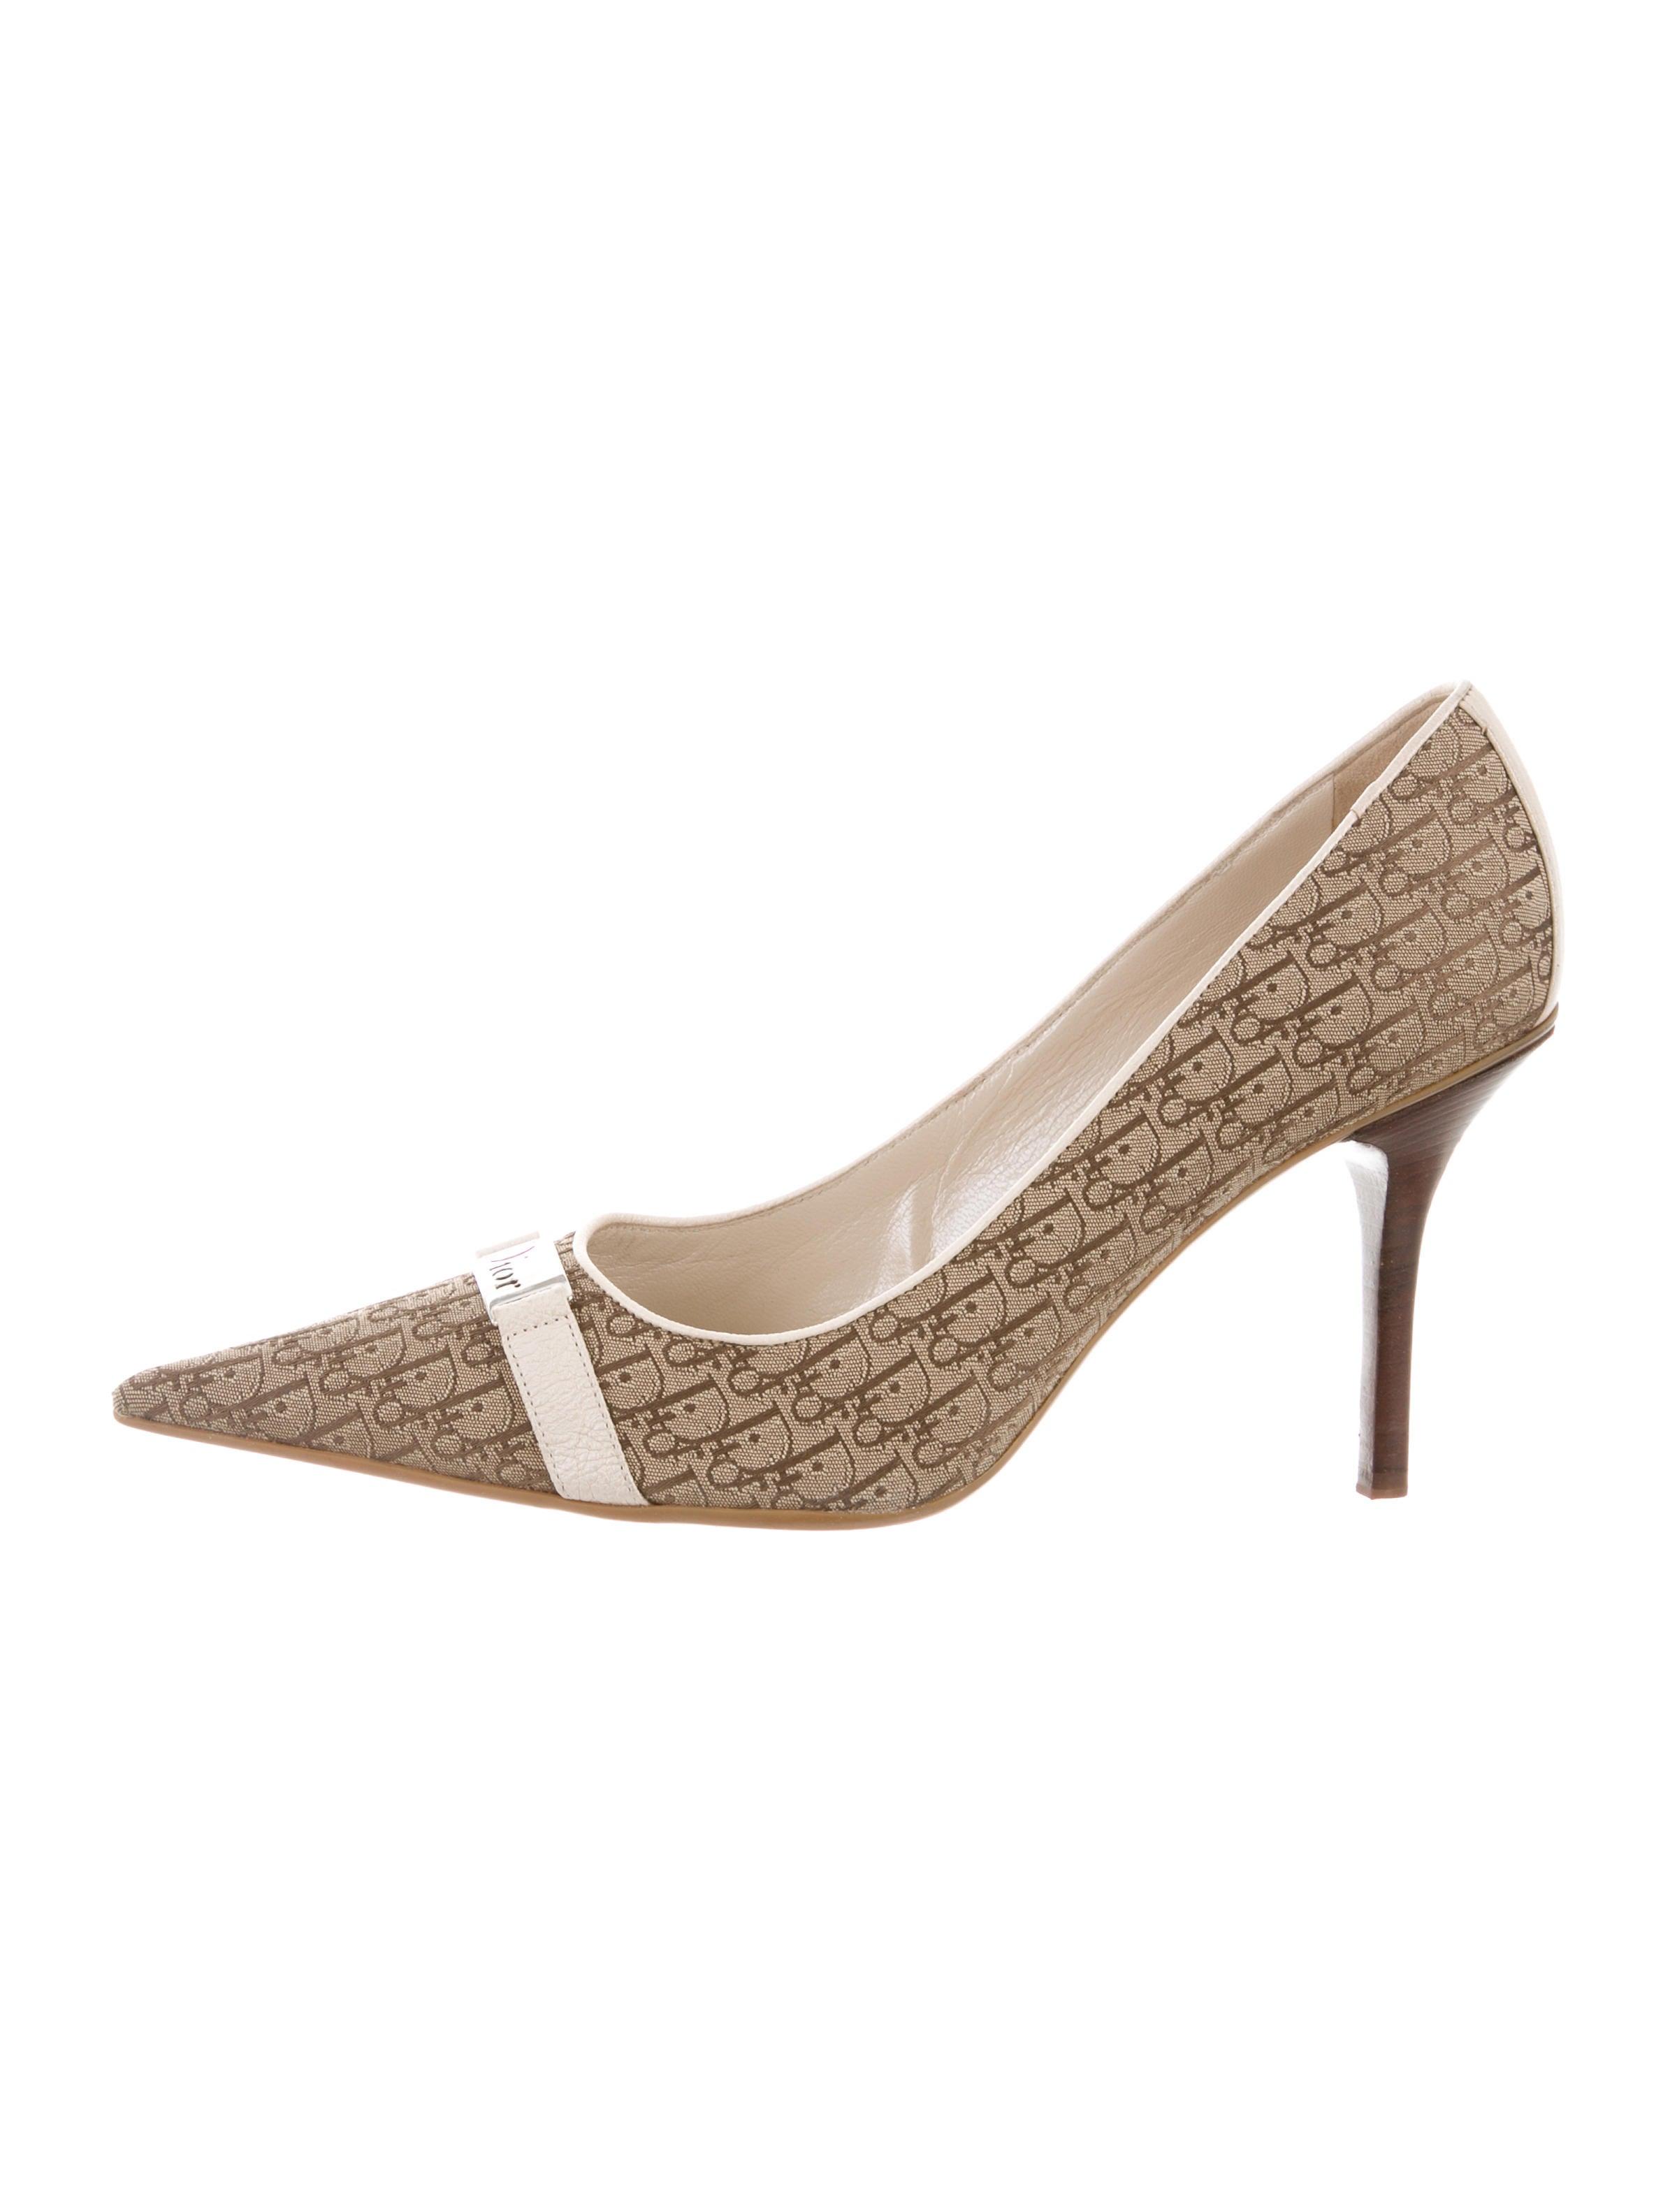 Christian Dior Diorissimo Peep-Toe Pumps cheap low price fee shipping 9rNjlUjm